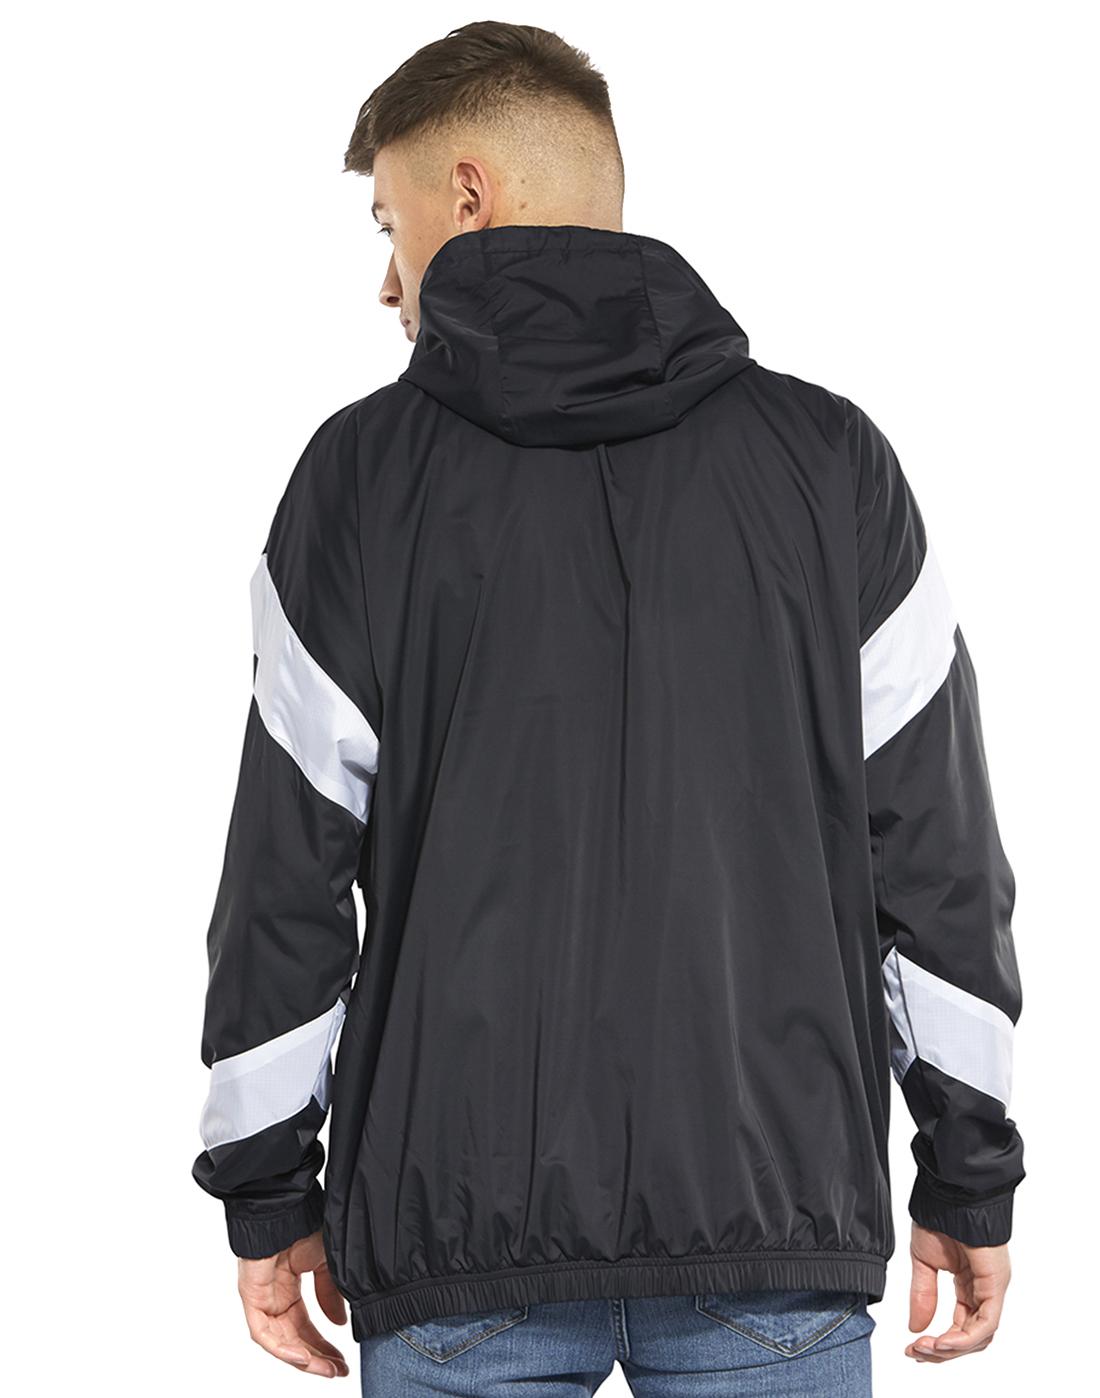 ace699fd32d0f7 Men s Nike Air Windrunner Jacket